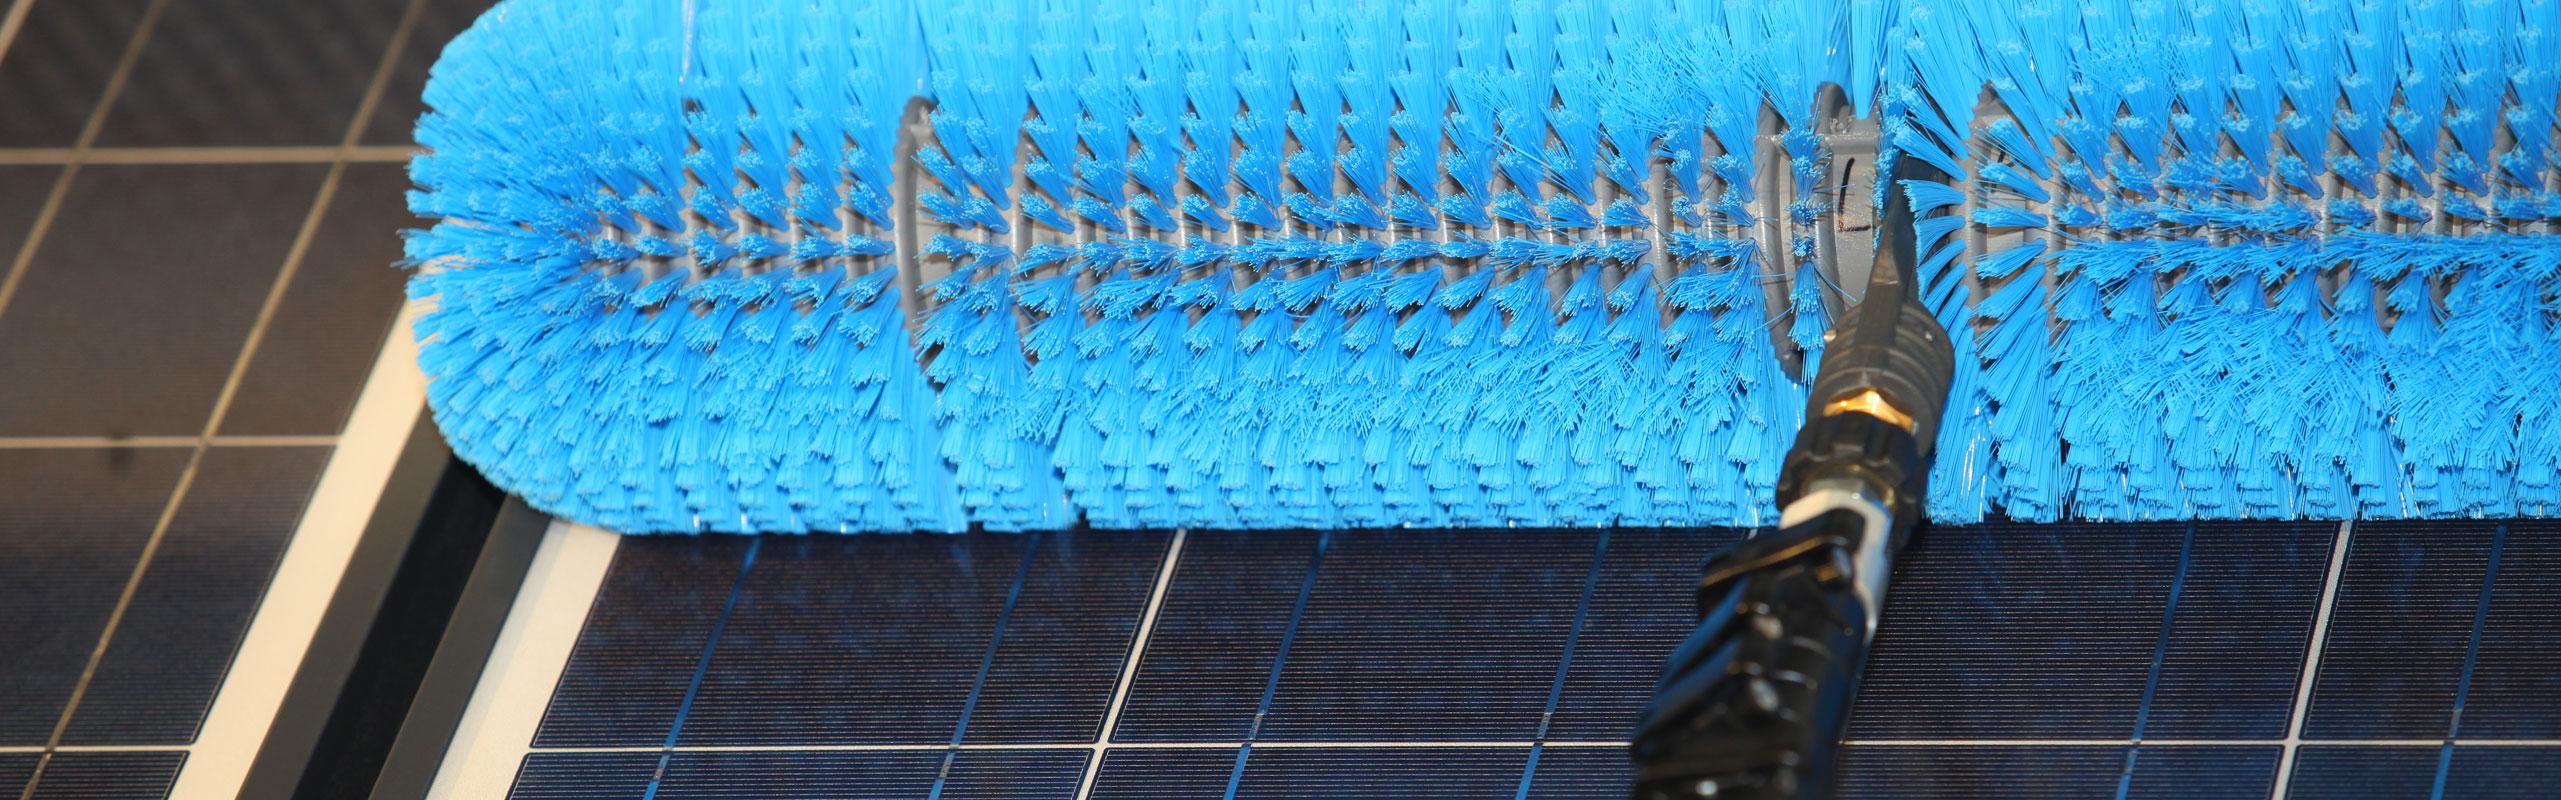 Photovoltaikreinigung